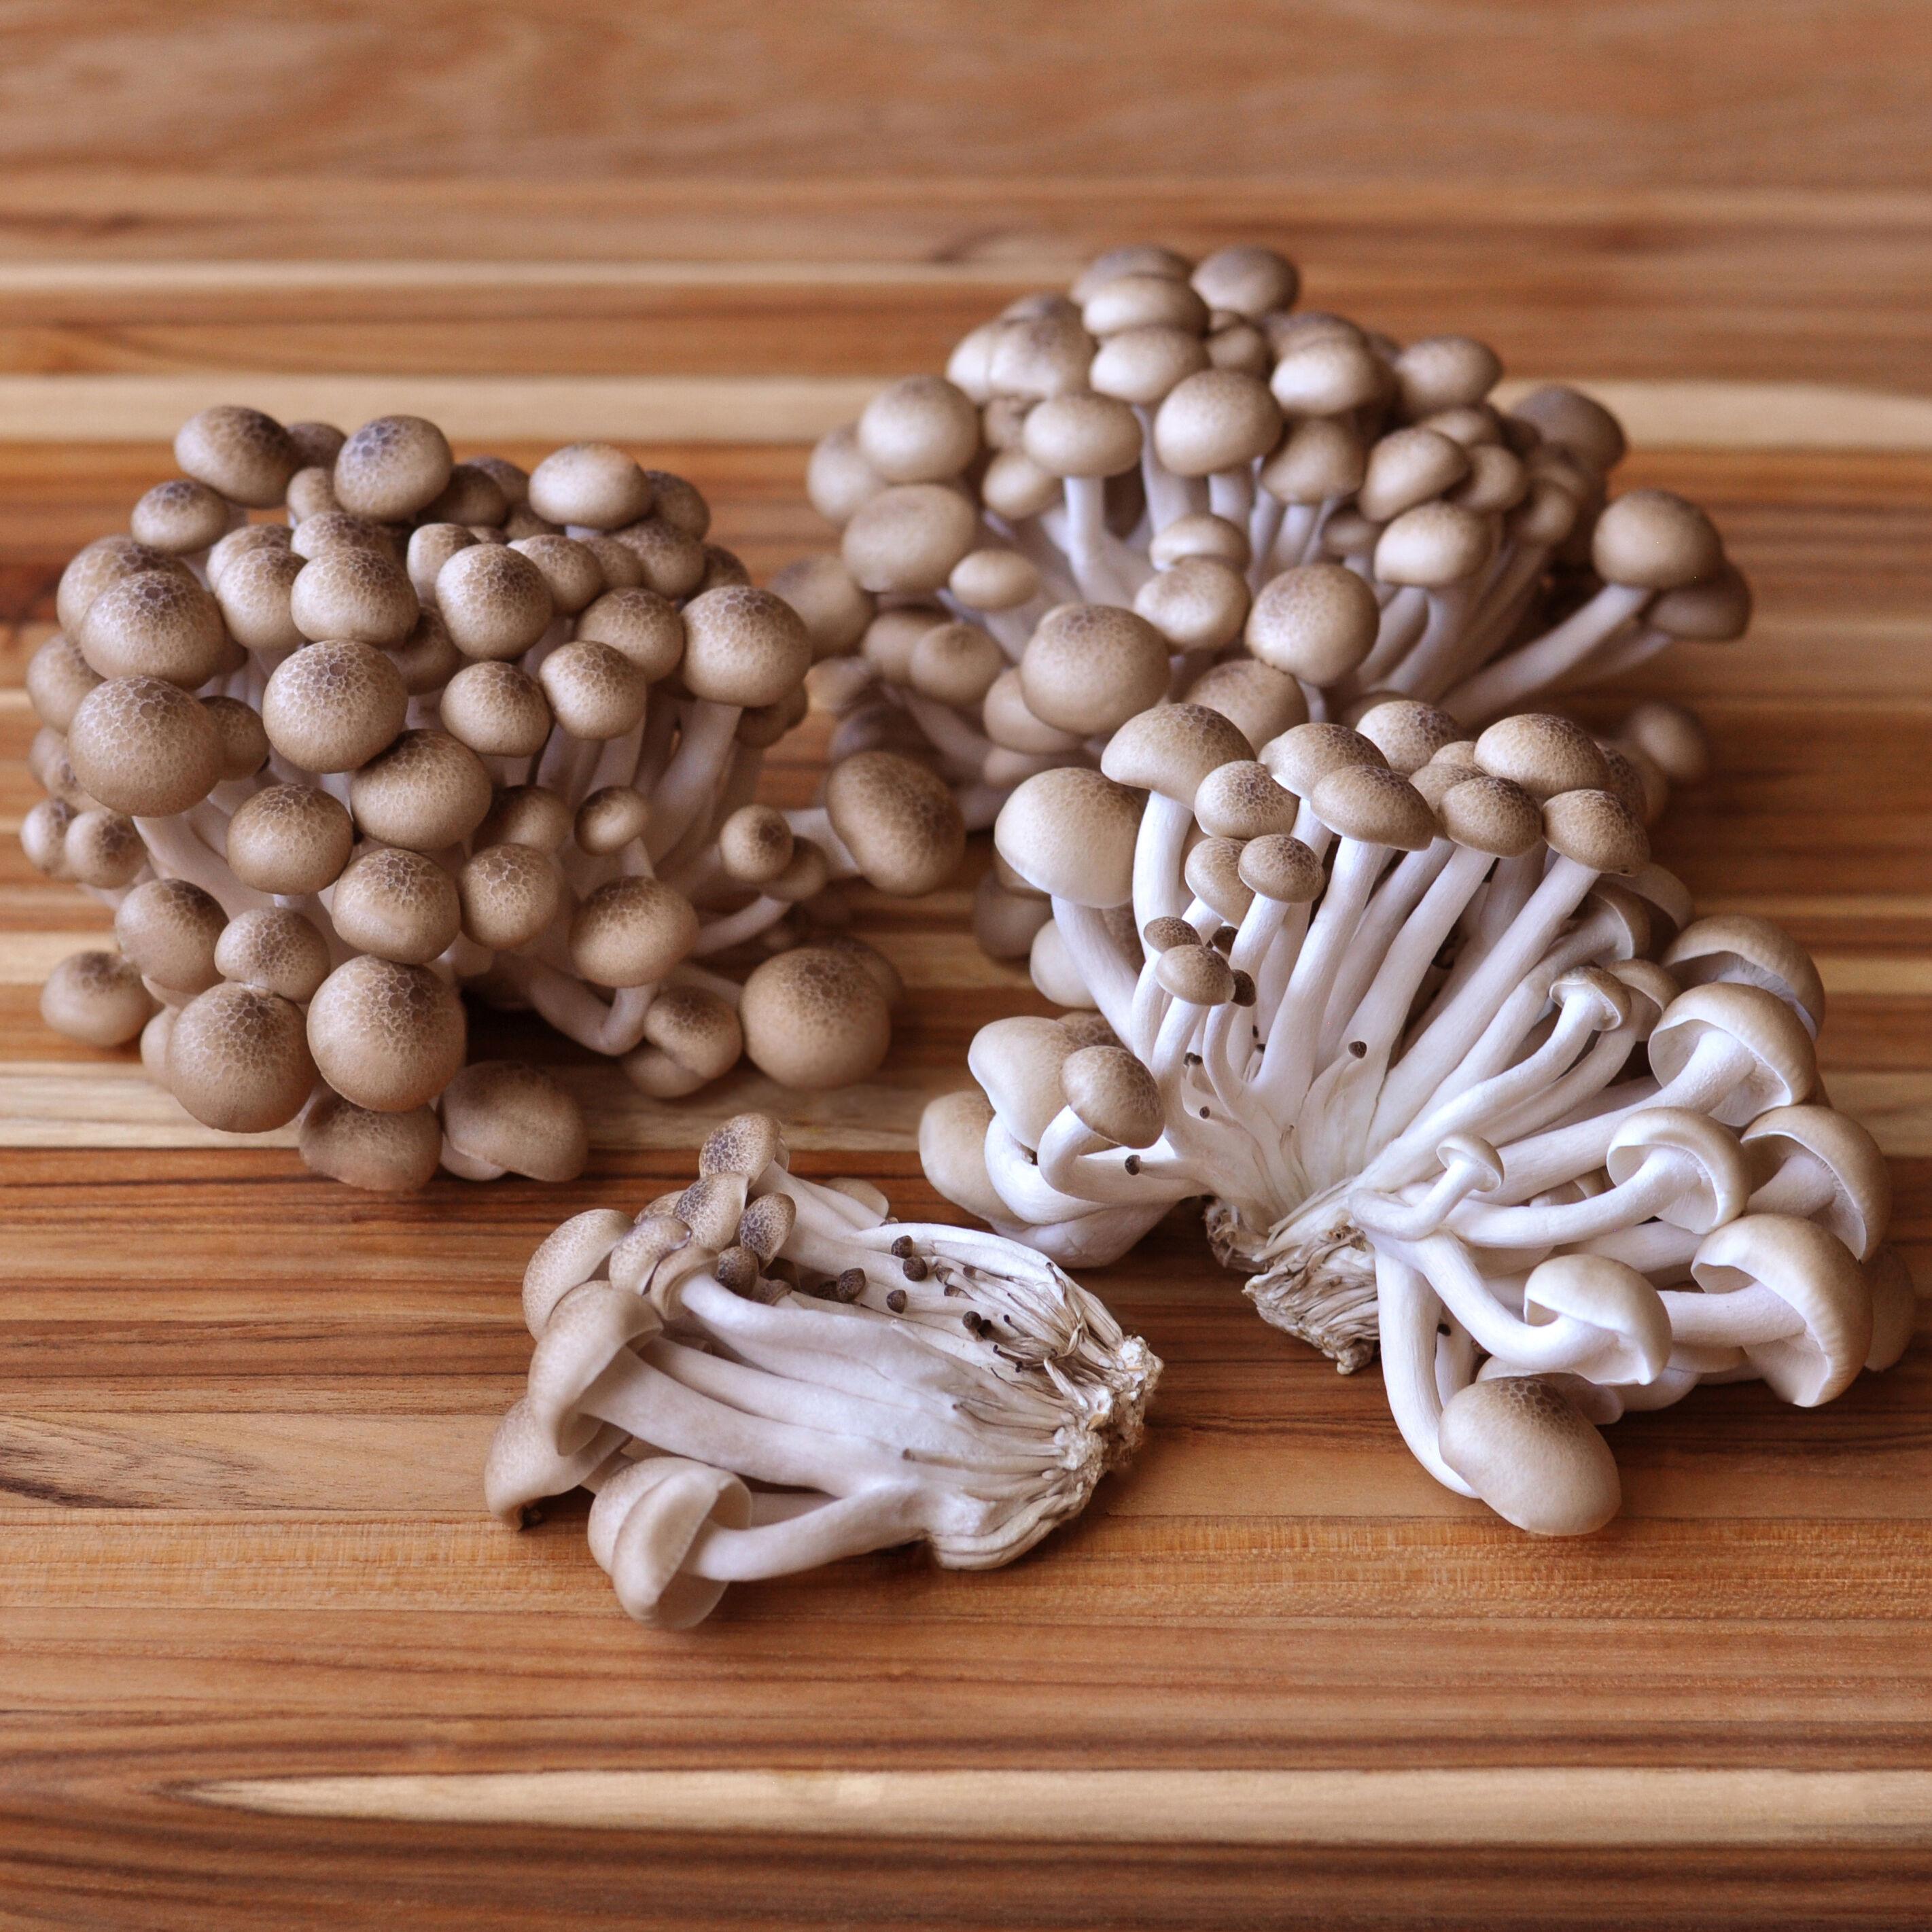 D'Artagnan Organic Hon-Shimeji Mushrooms: Fresh / 3lbs avg. each (Domestic) by D'Artagnan